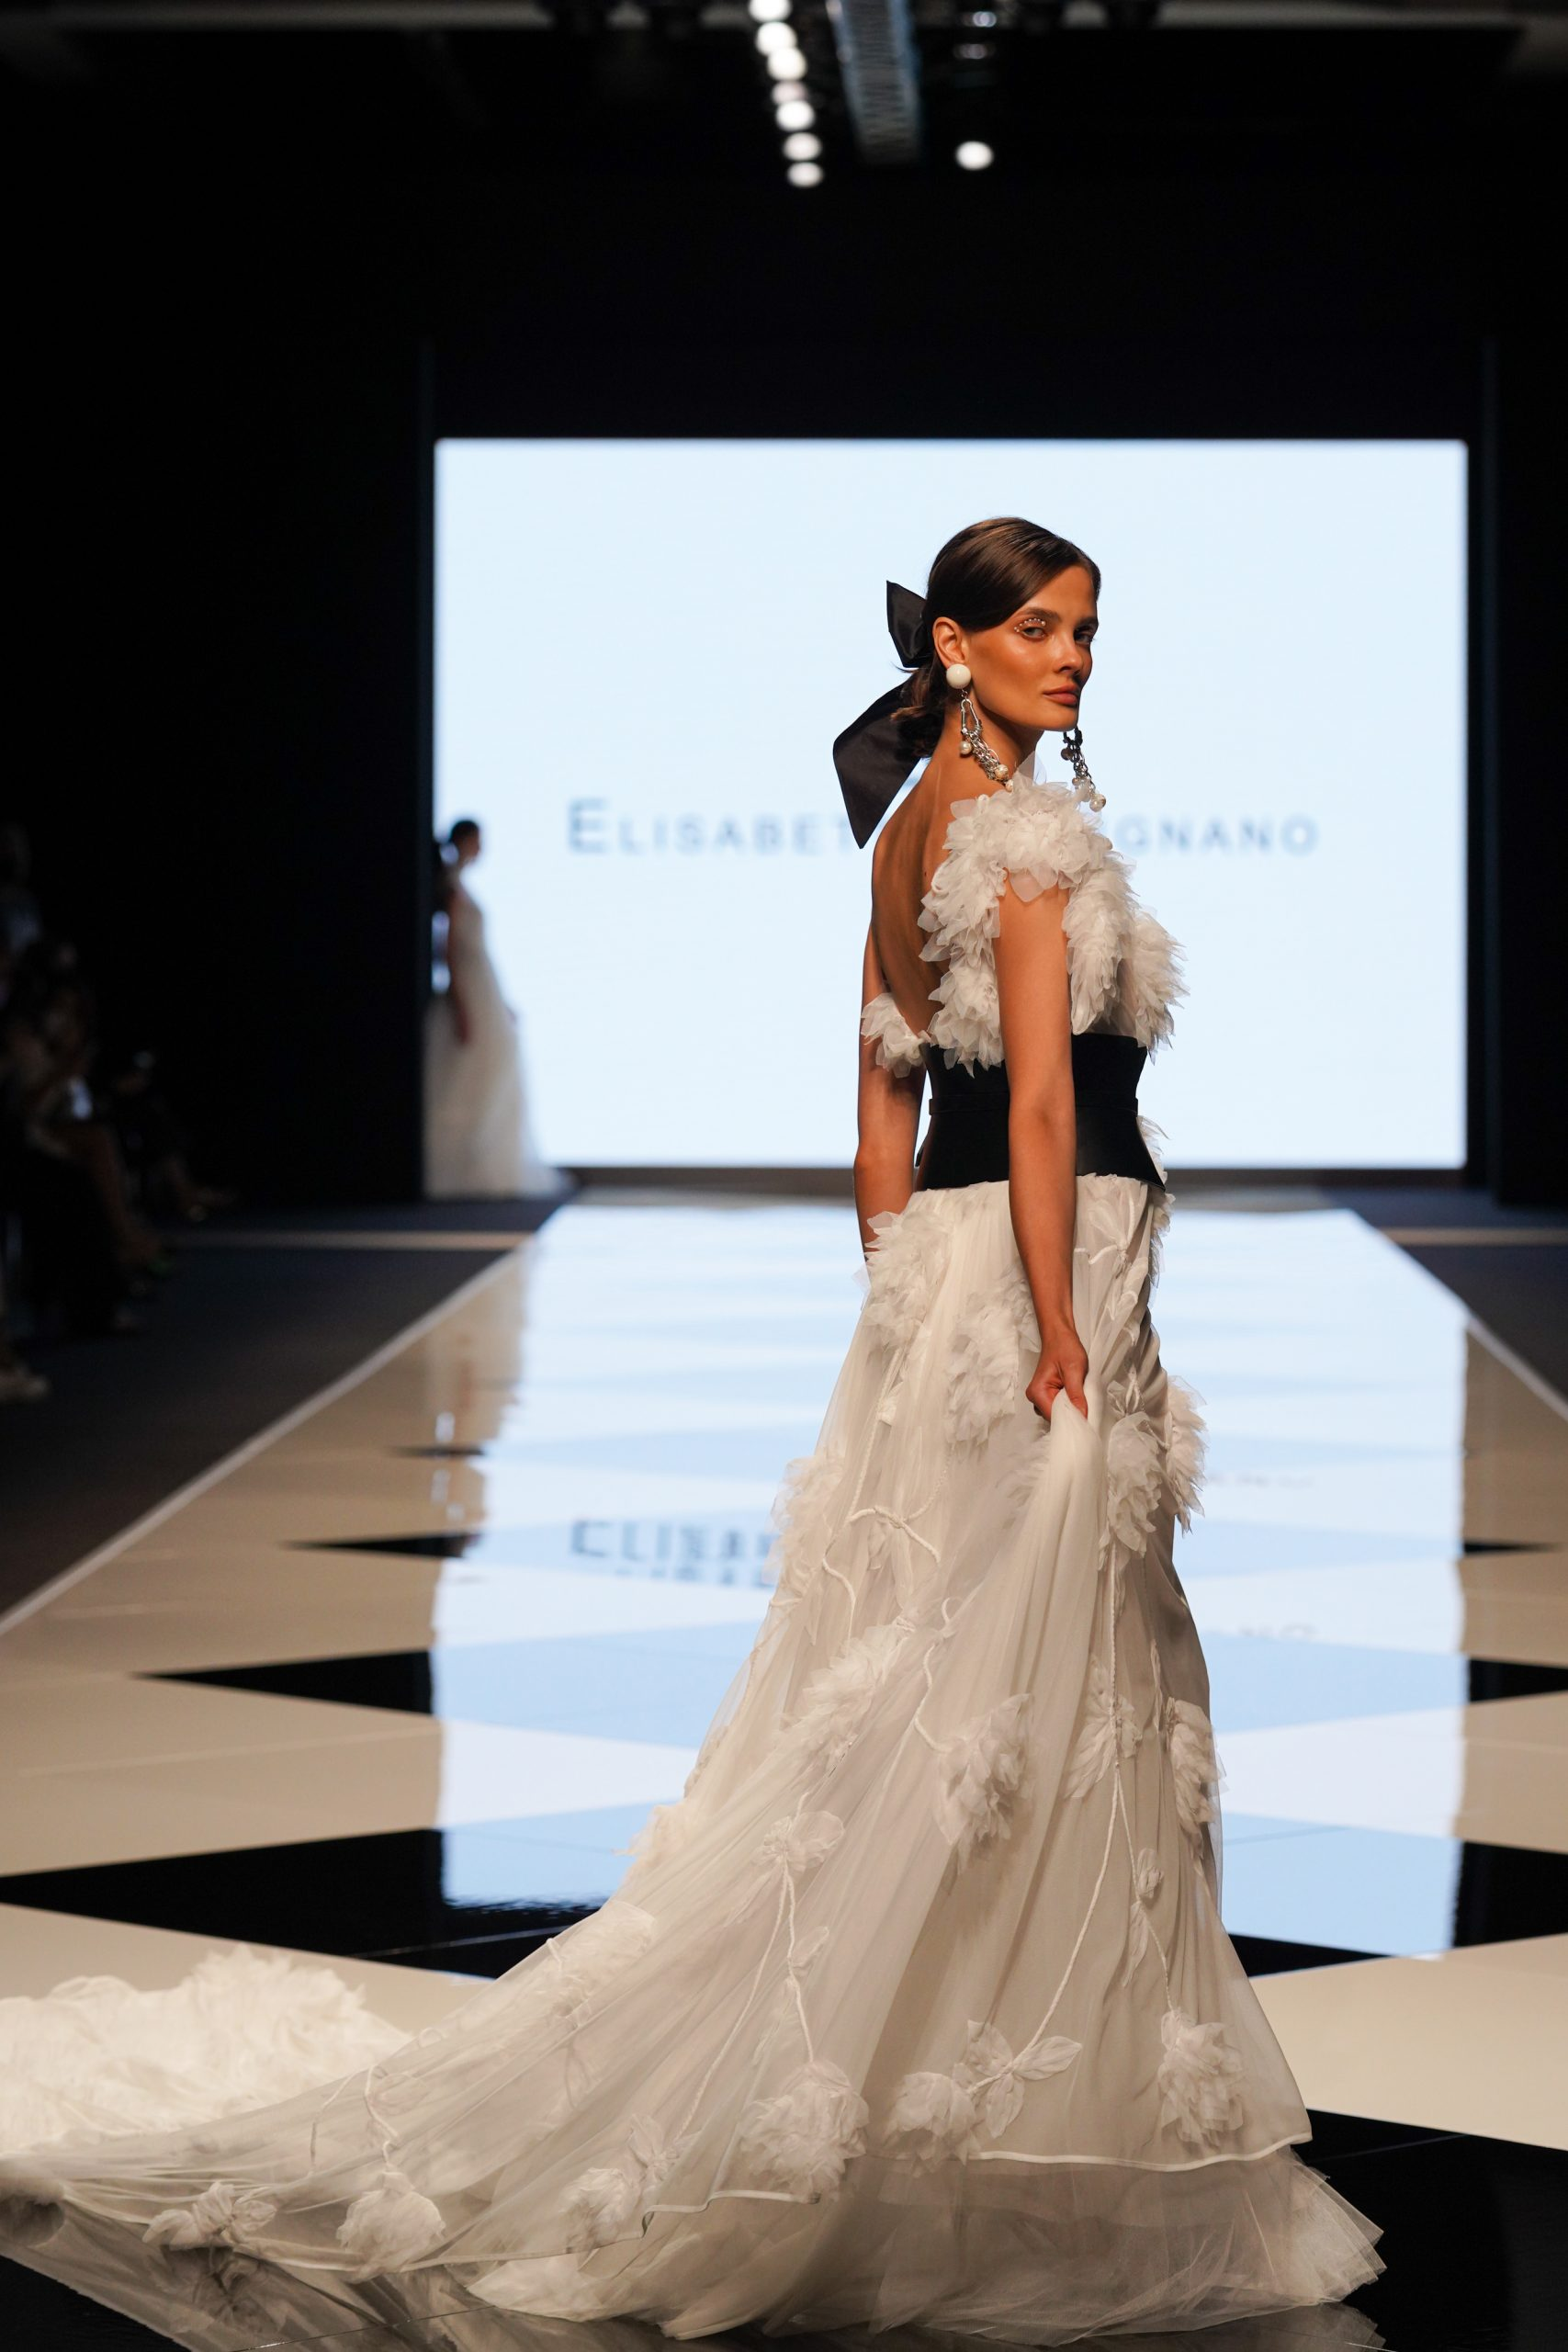 Si Sposaitalia Collezioni: i fashion show